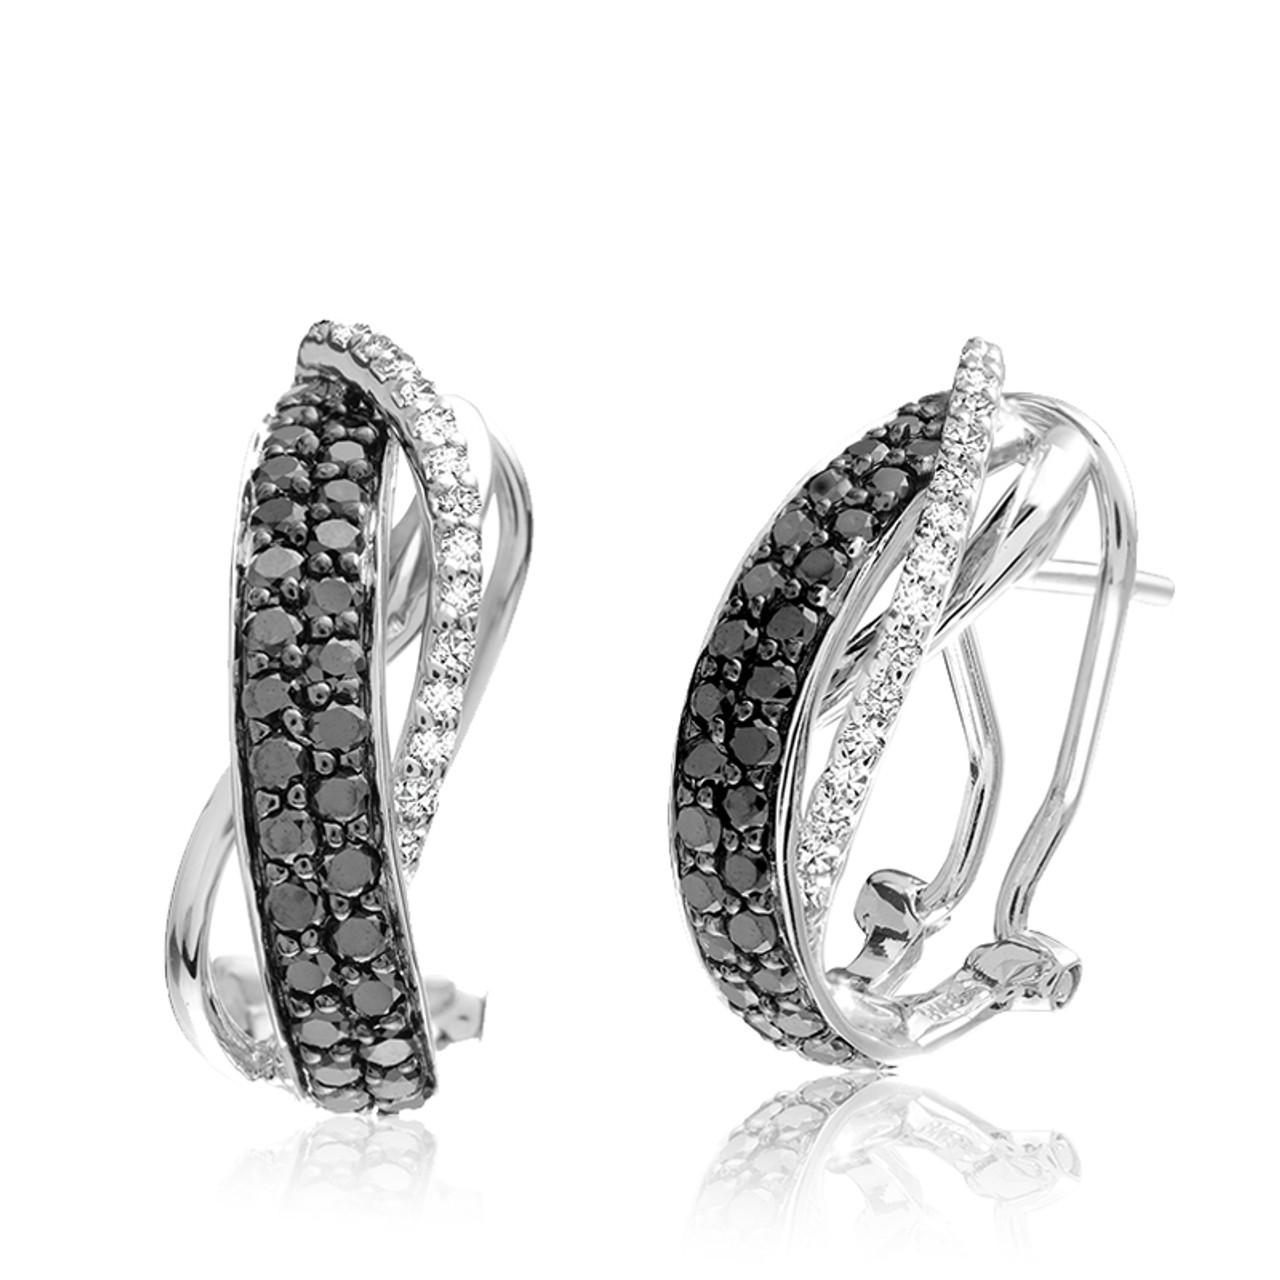 600022552baae DIAMOND EARRING #13-040502